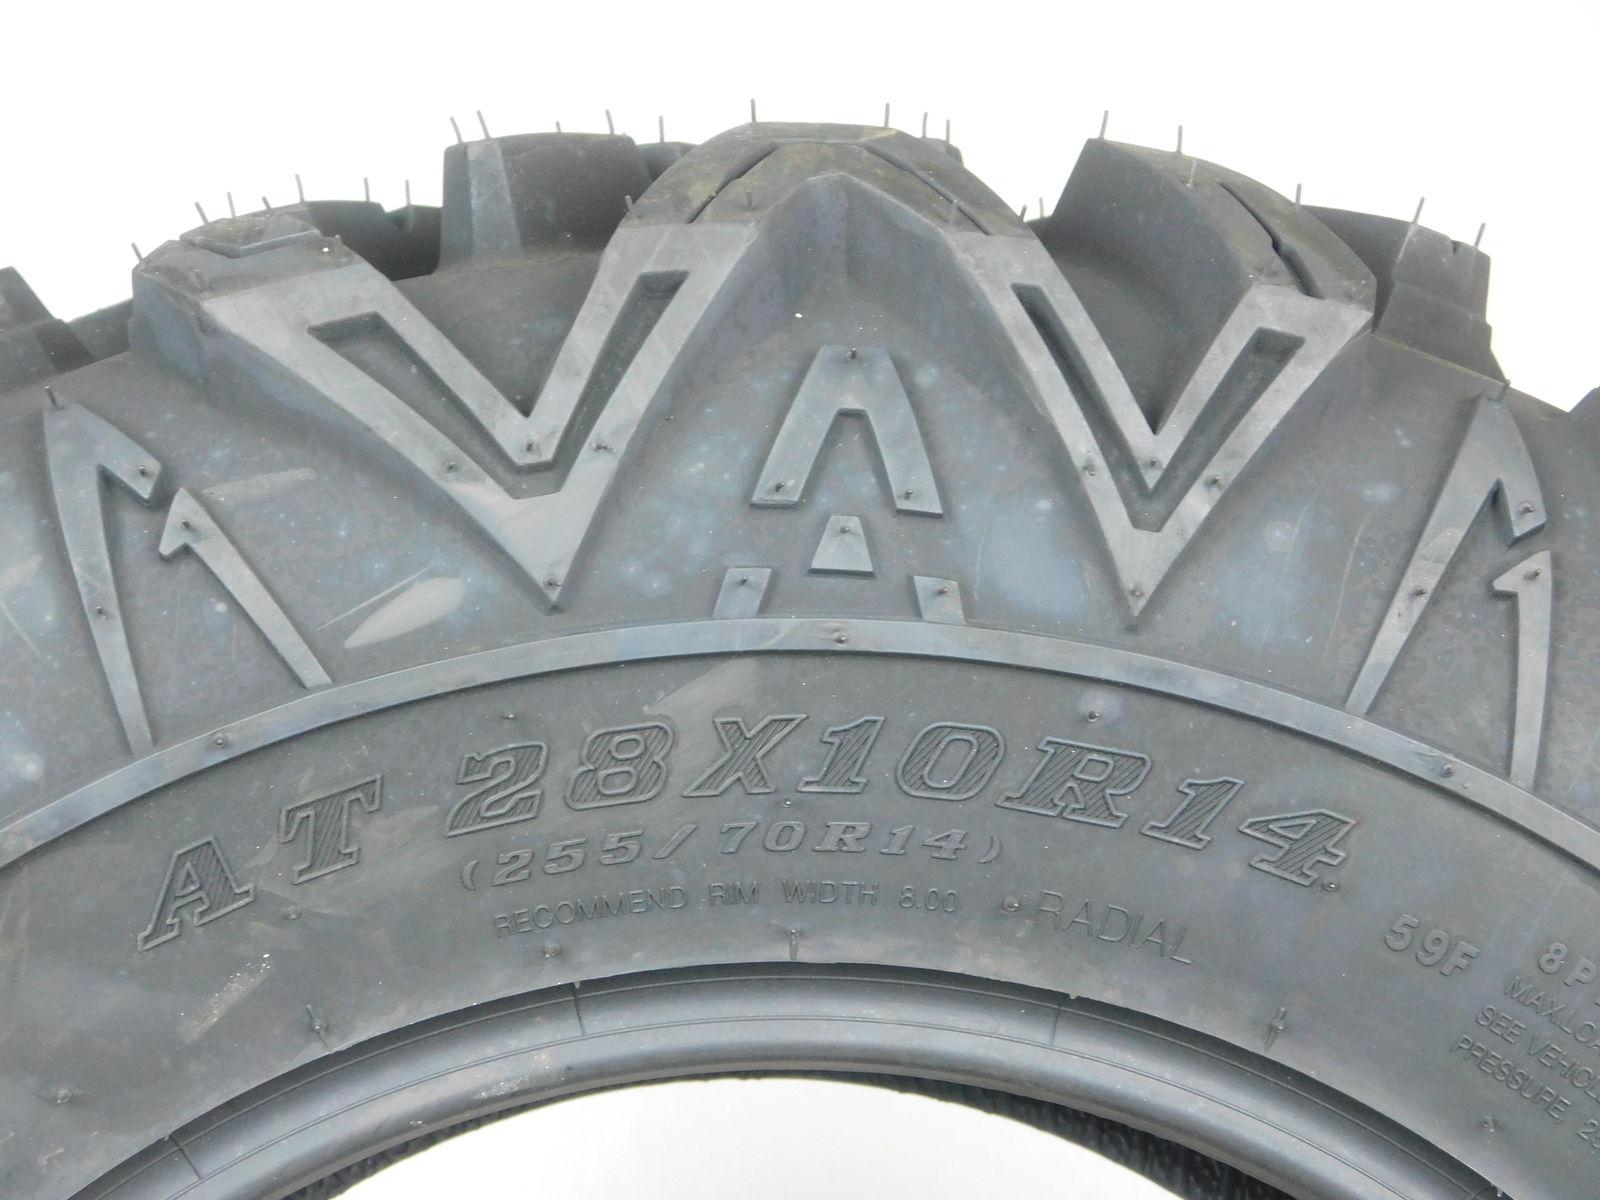 Arisun-28x10-14-Tires-Bruiser-XT-RADIAL-8ply-255-70R14-N4D-Protection-image-4